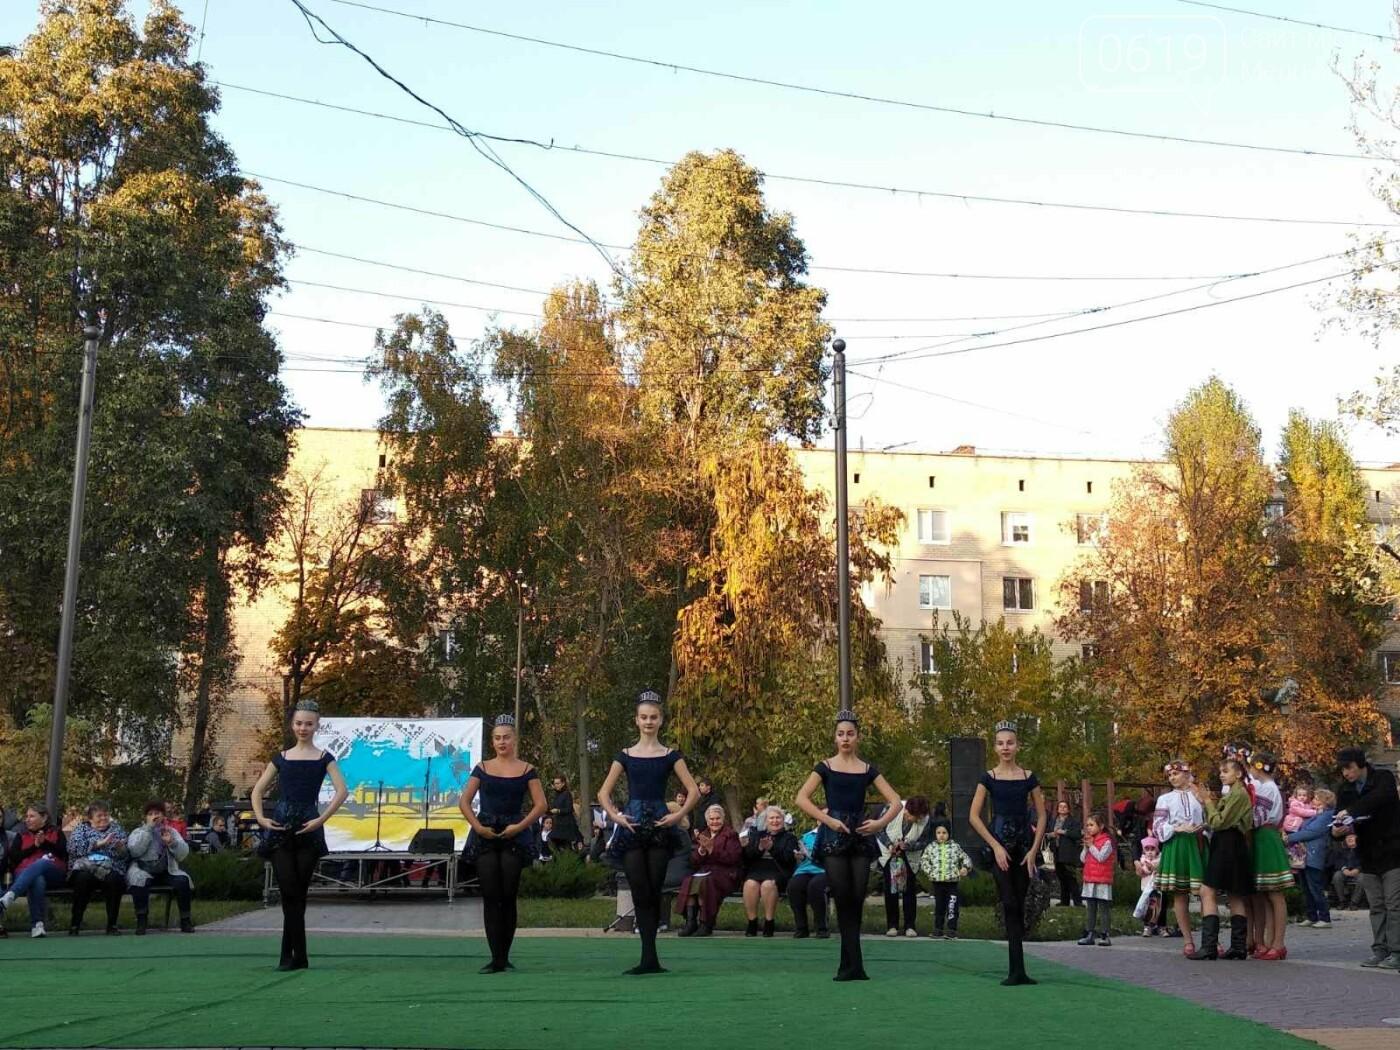 Жители микрорайона отметили День освобождения Мелитополя, - ФОТО , фото-6